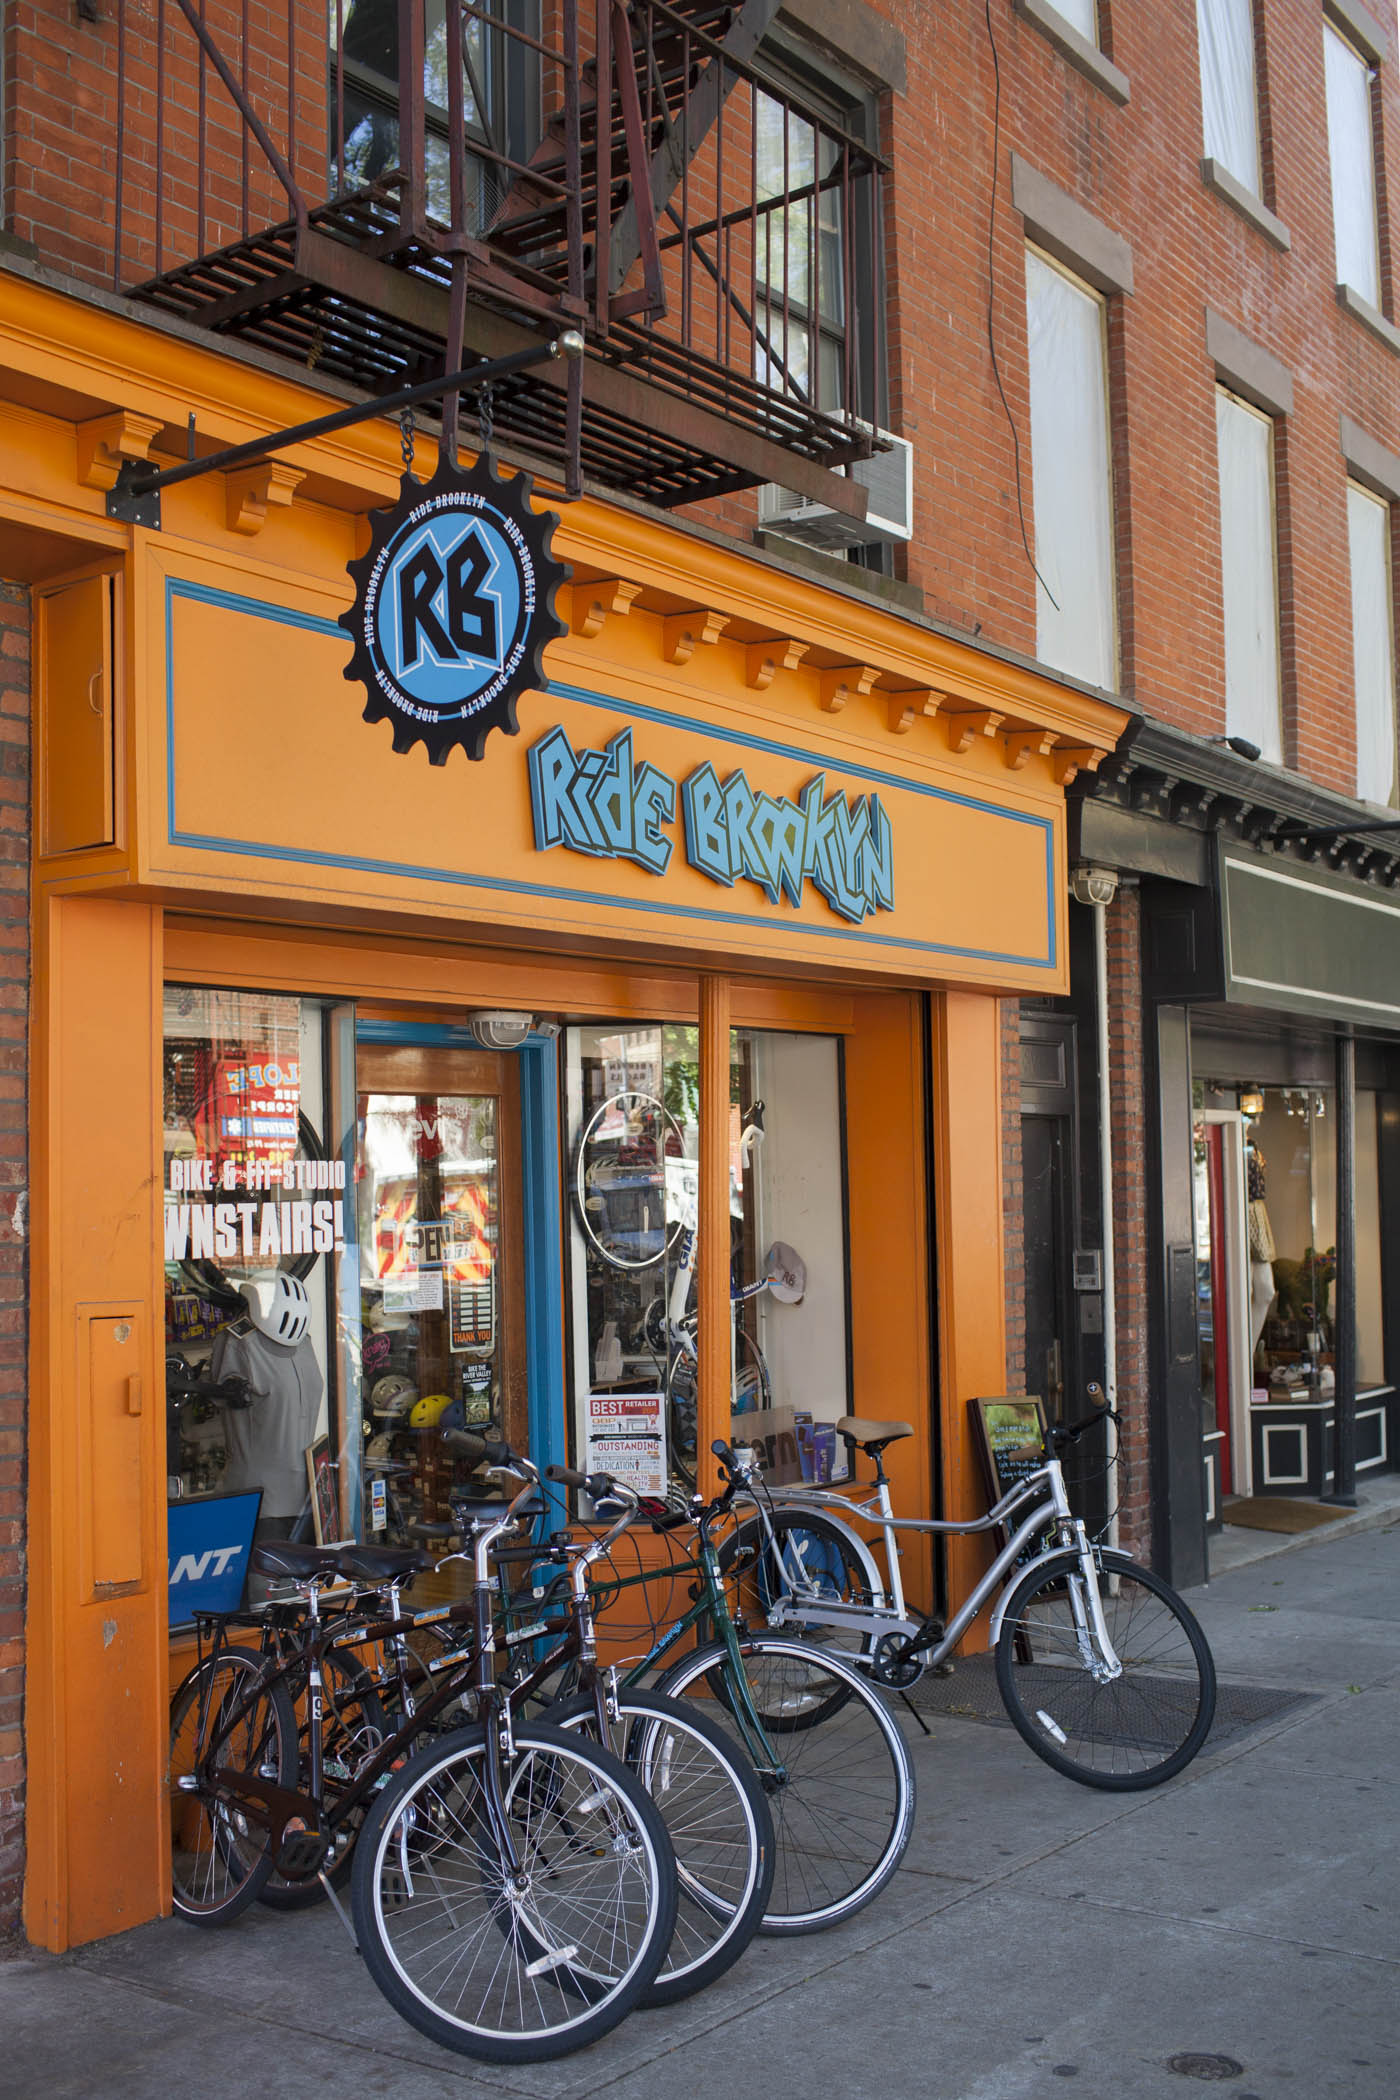 Liz Calvi, Photographer, Editorial Photography, Advertising Photography, London Photographer, Small Business Saturday, American Express, Park Slope NYC, Brooklyn, Ride Brooklyn, Brand Narrative